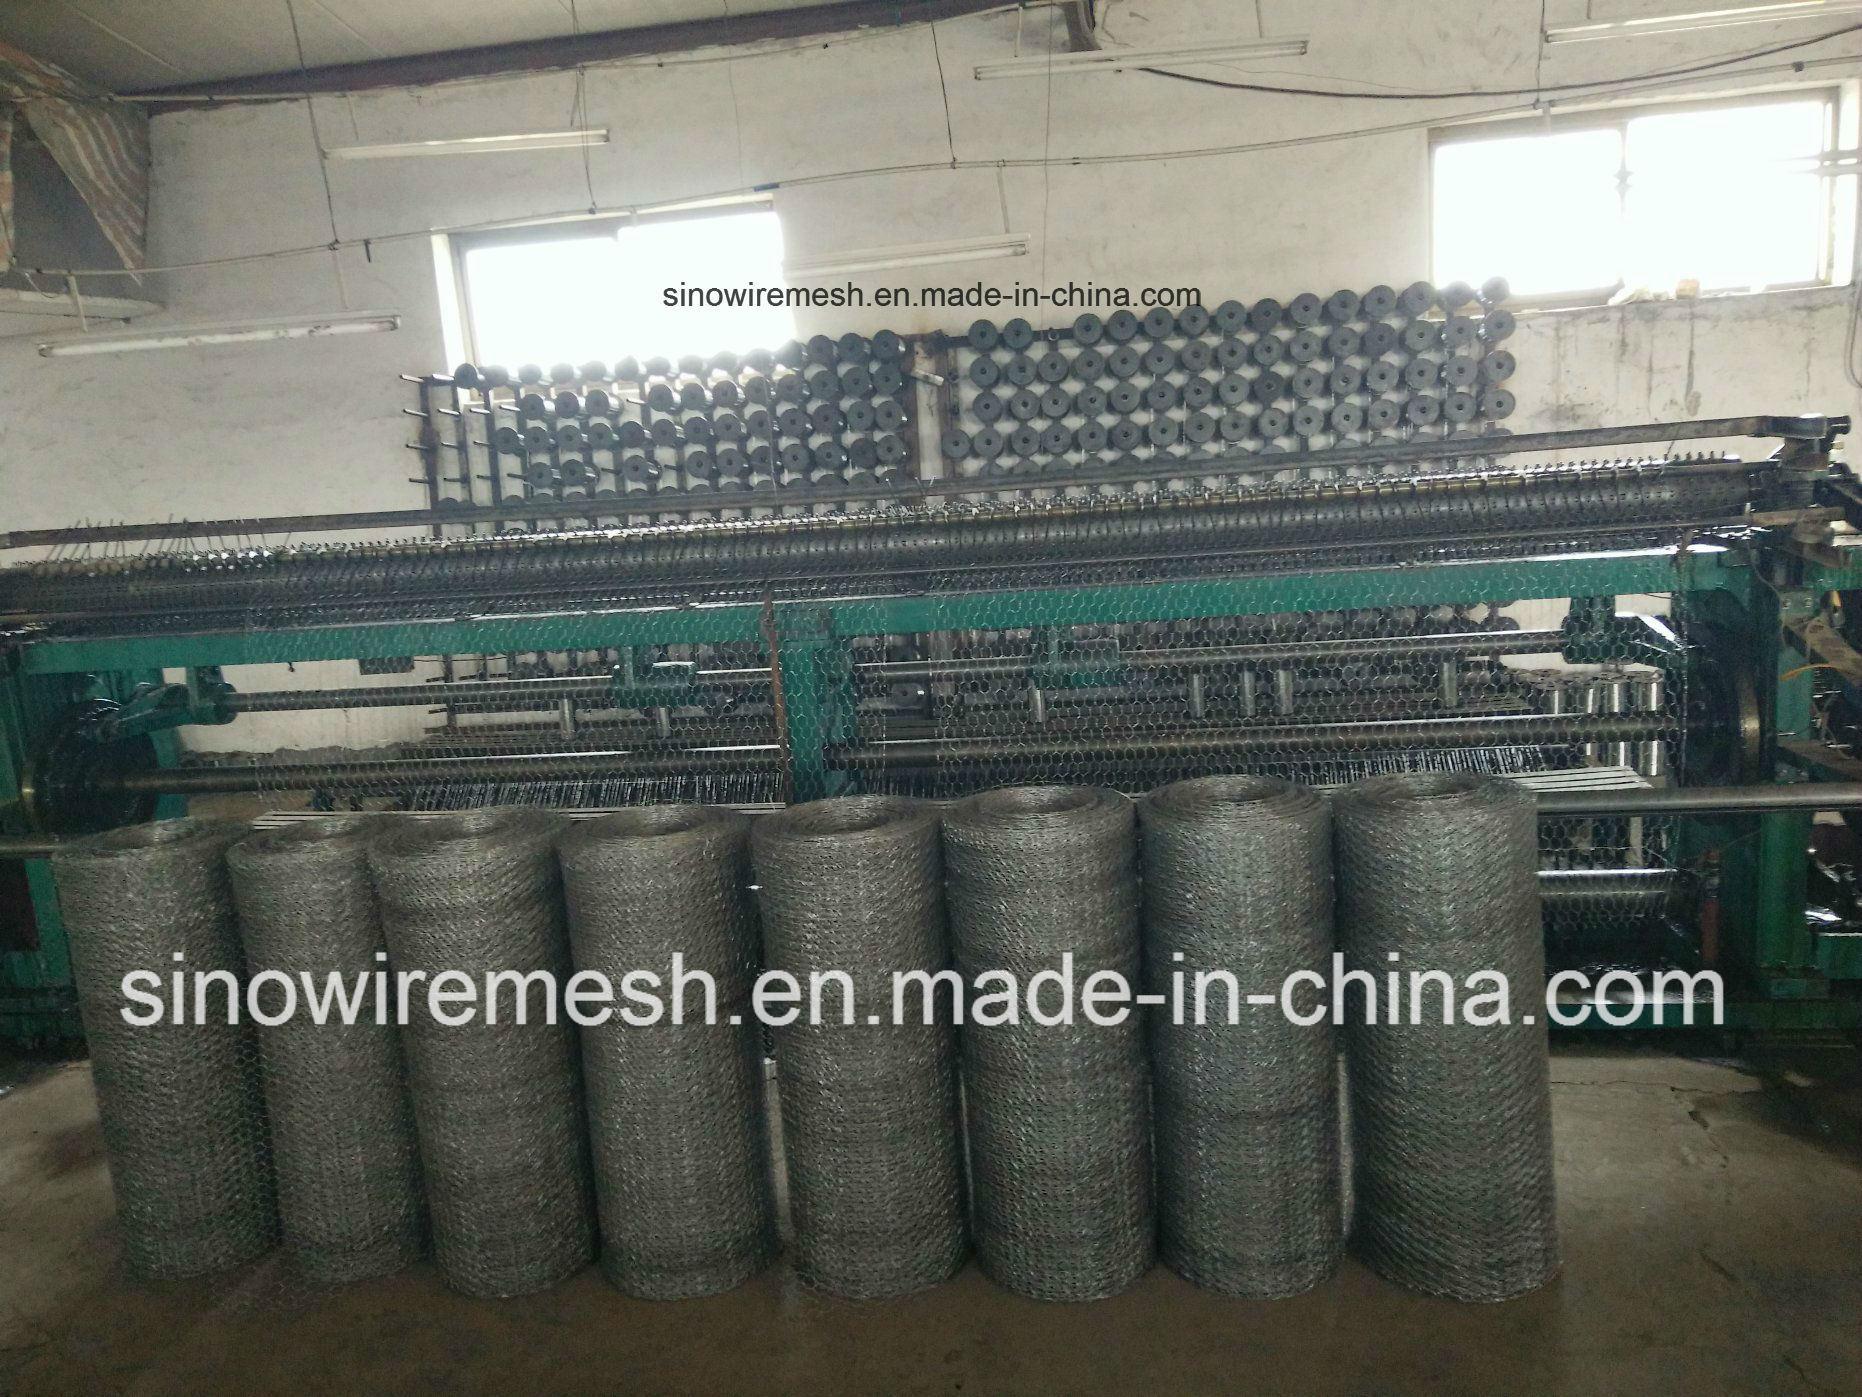 Sailin Factory Hexagonal Wire for Netting